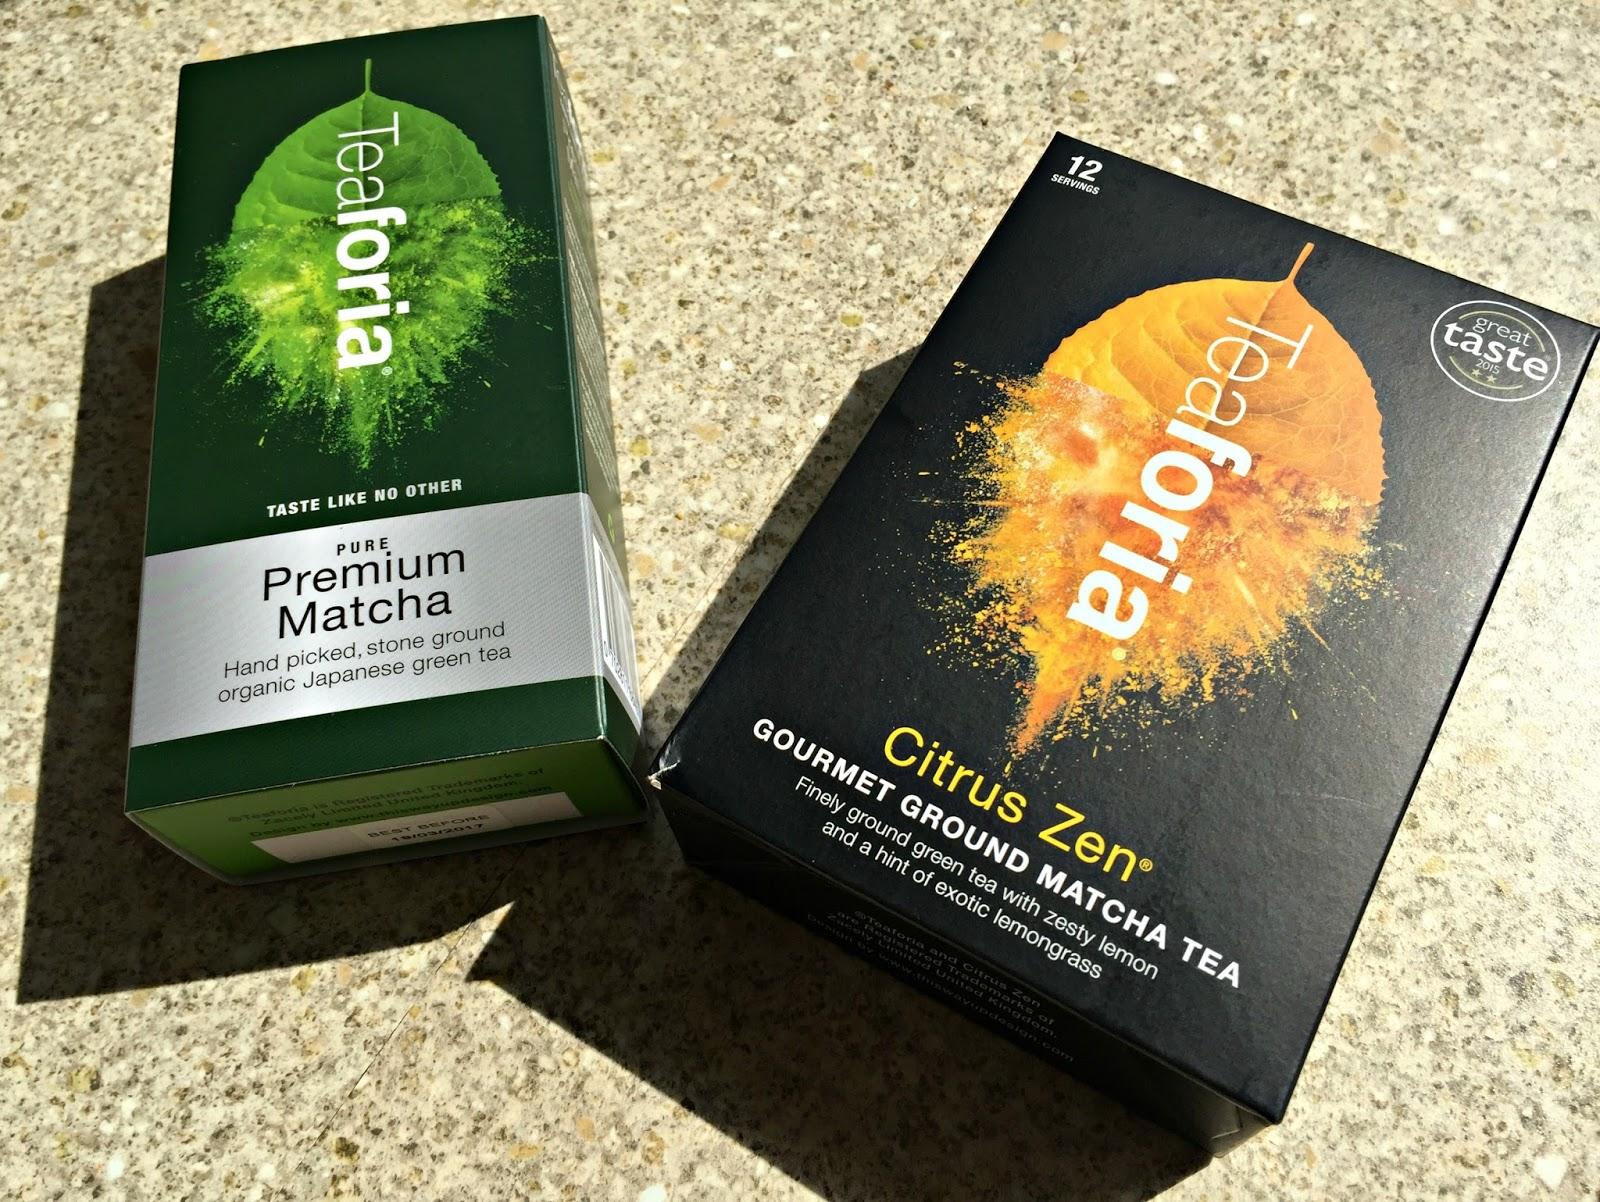 Teaforia Ground Matcha Tea Review